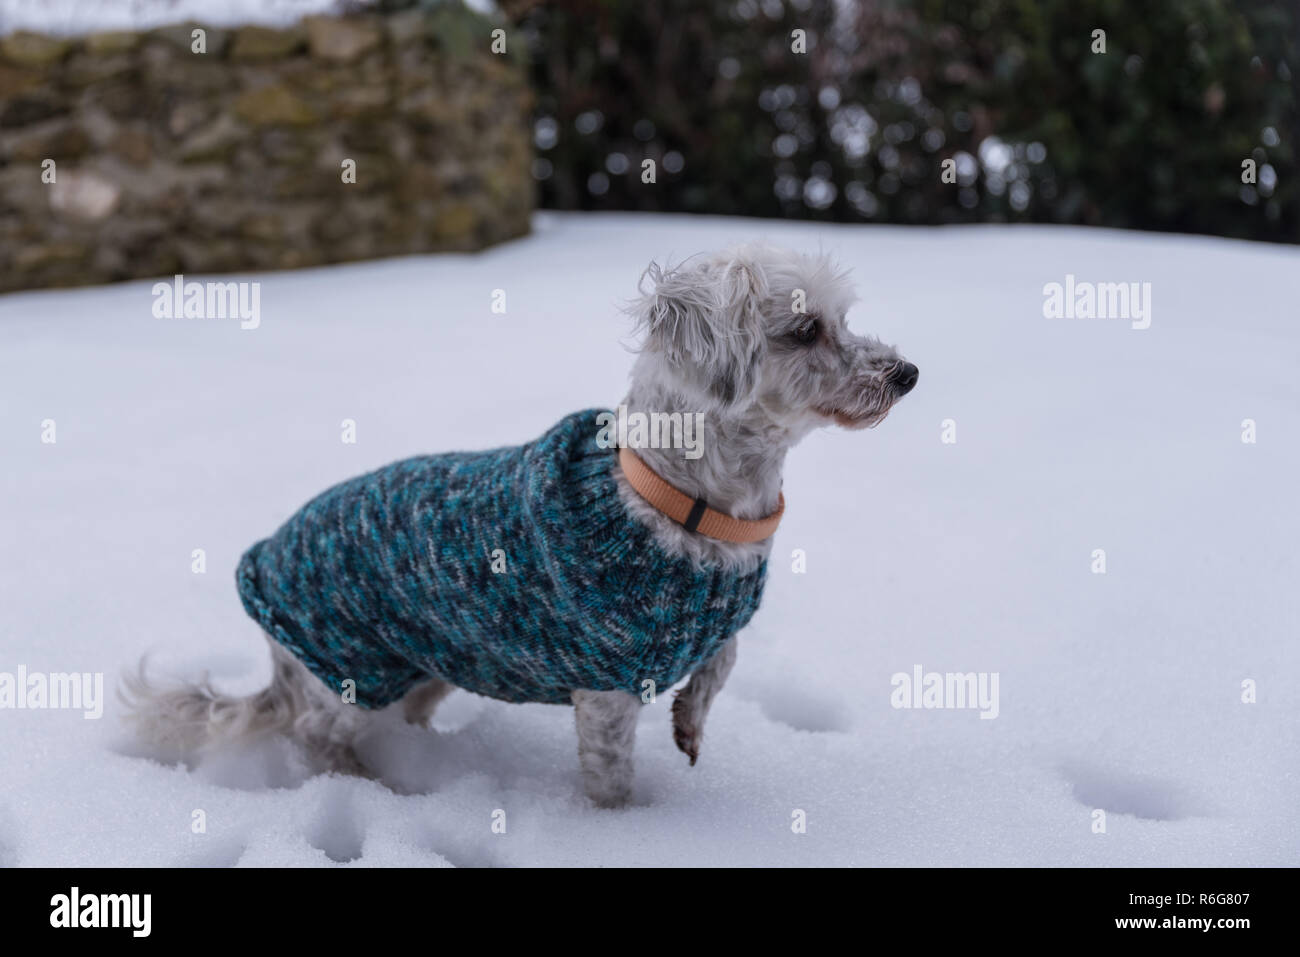 curious dog with dog coat - Stock Image